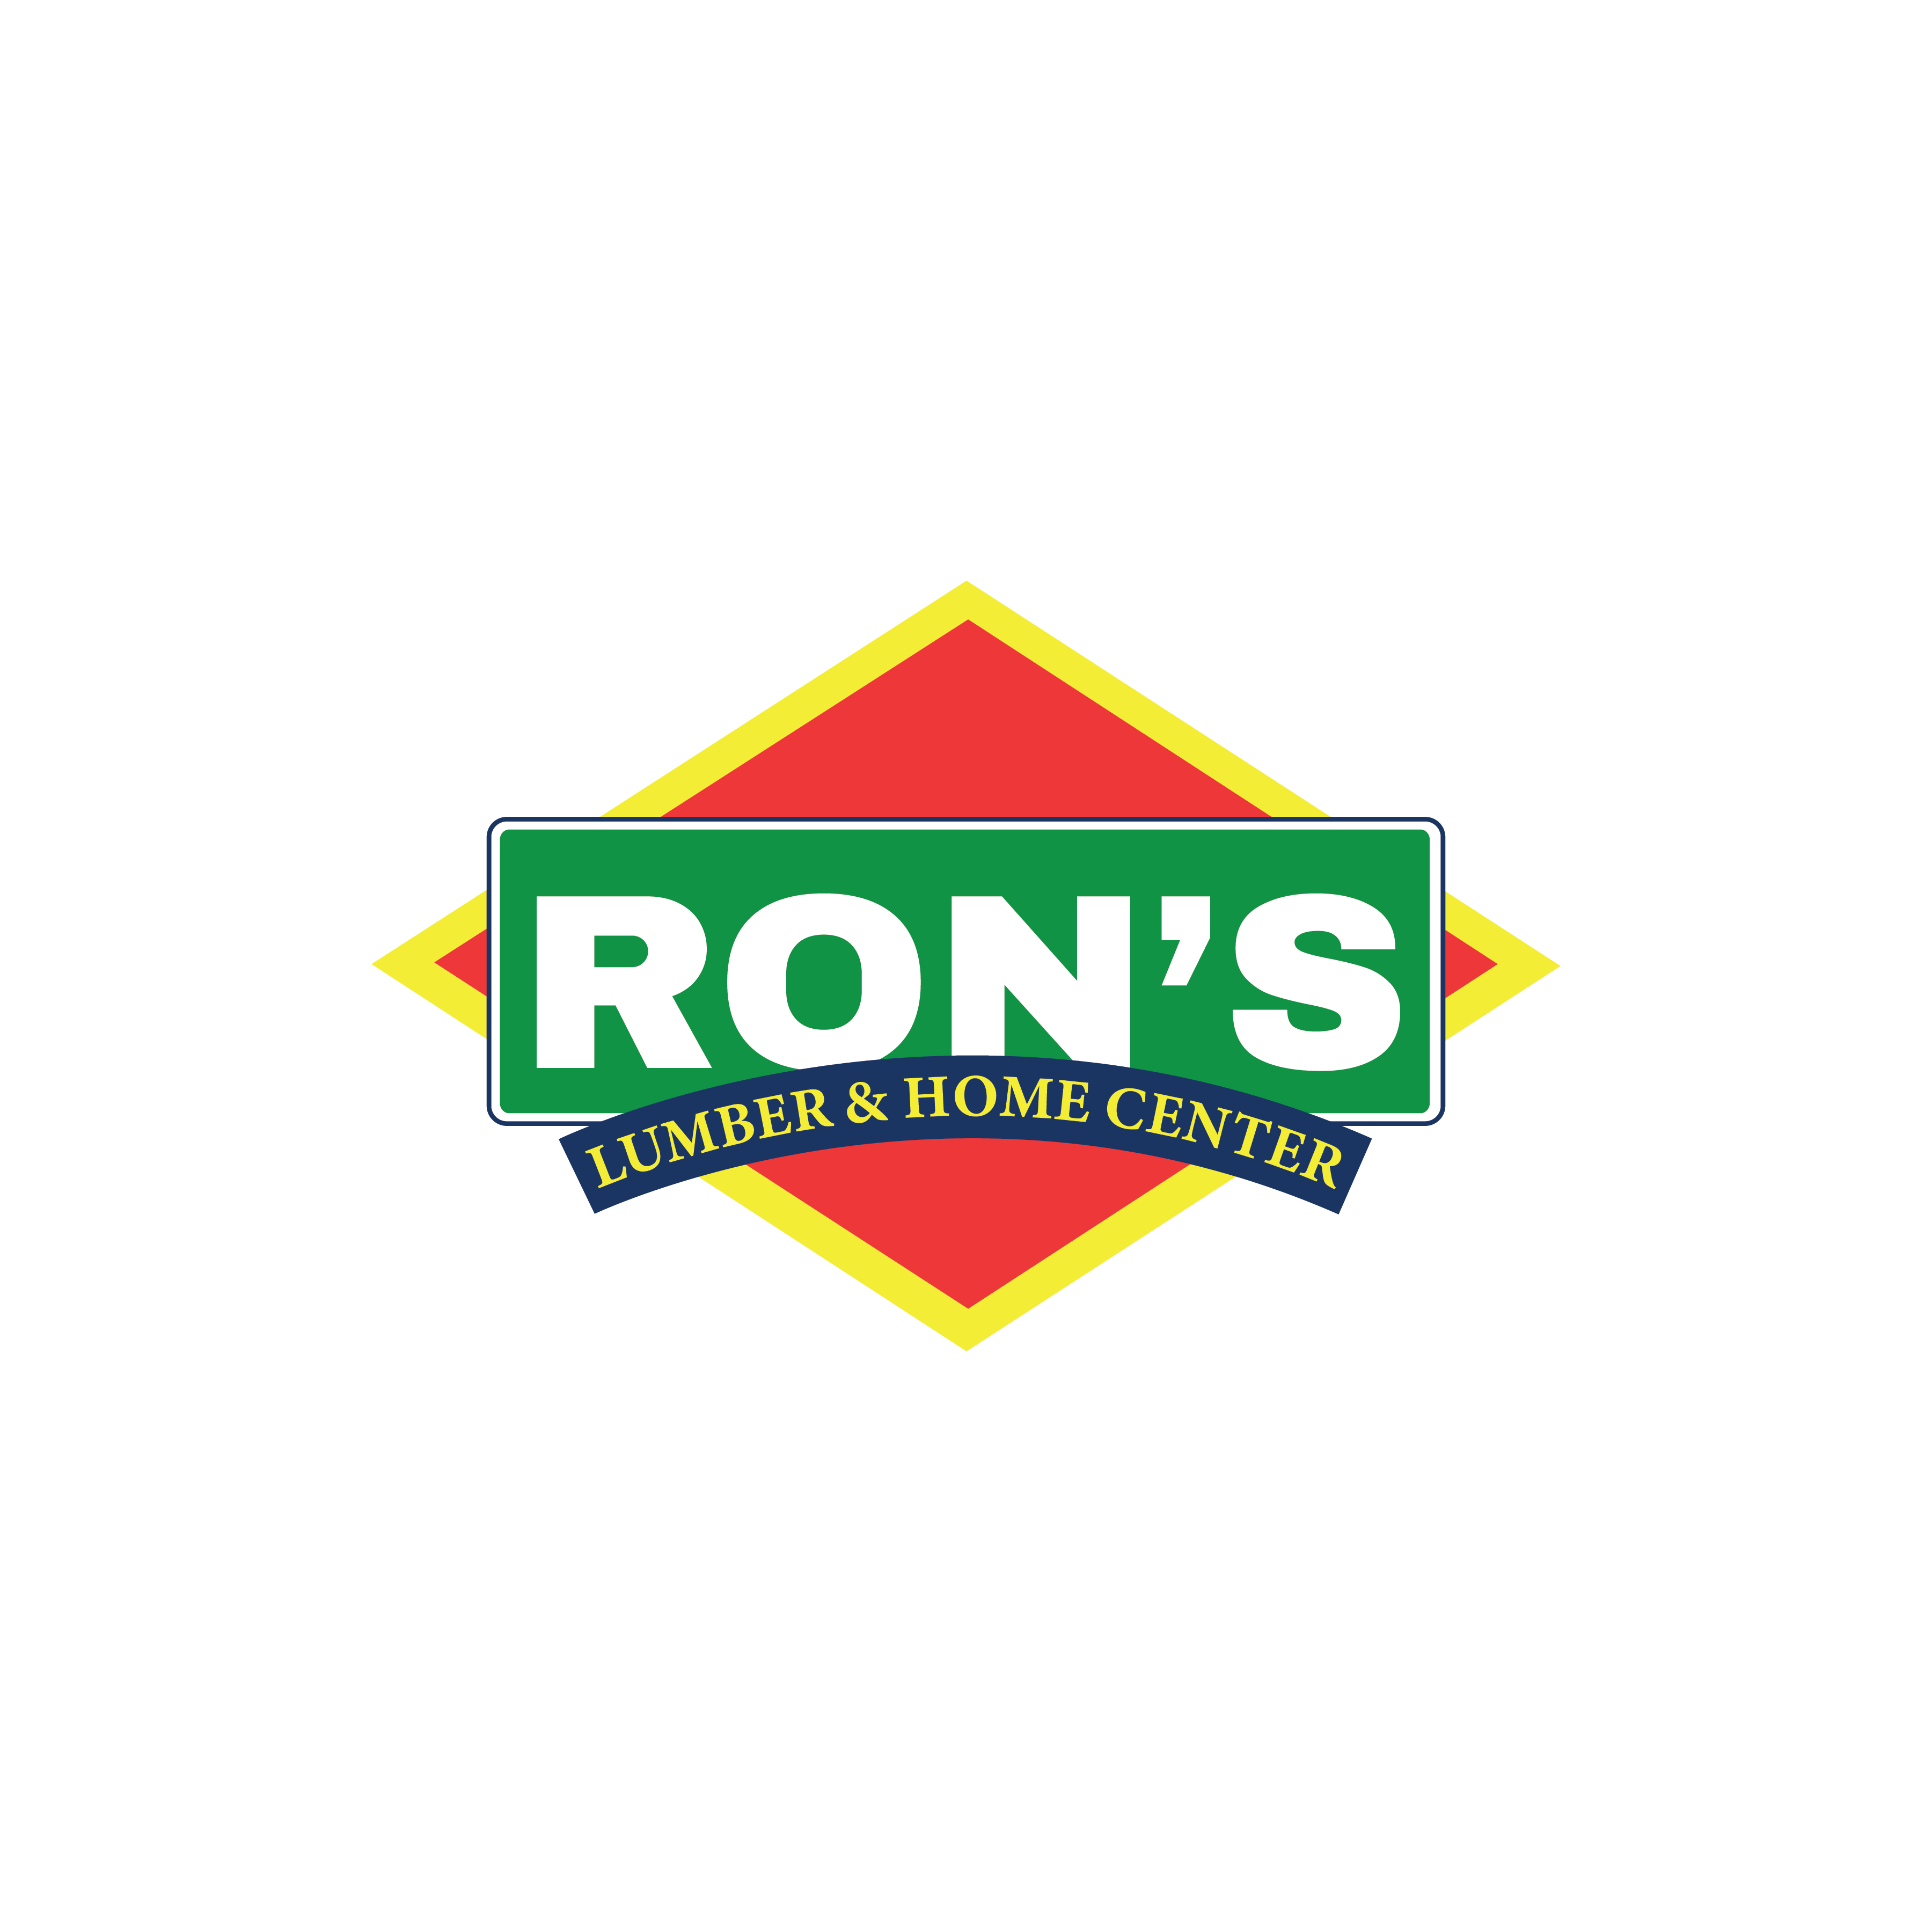 Ron's Lumber & Home Center